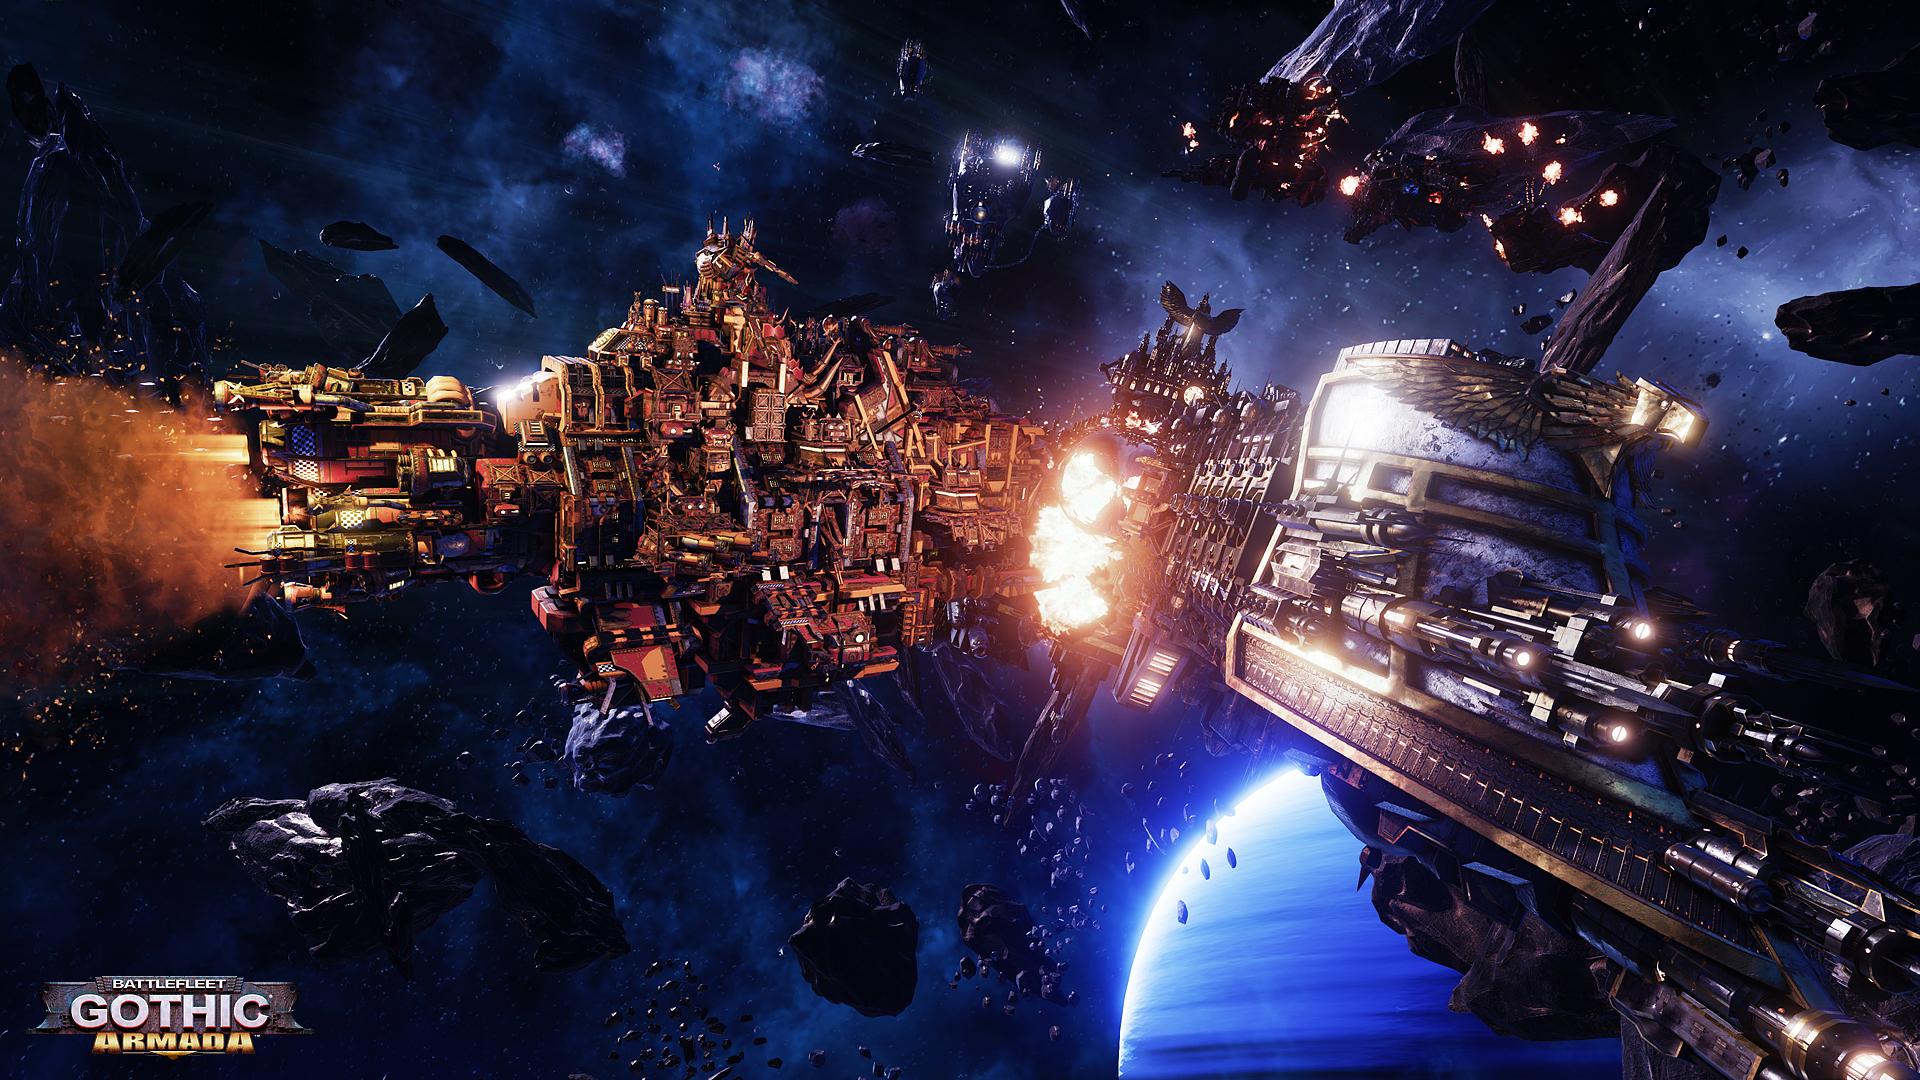 battlefleet gothic armada warhammer 40k Wallpaper HD Games 4K 1920x1080